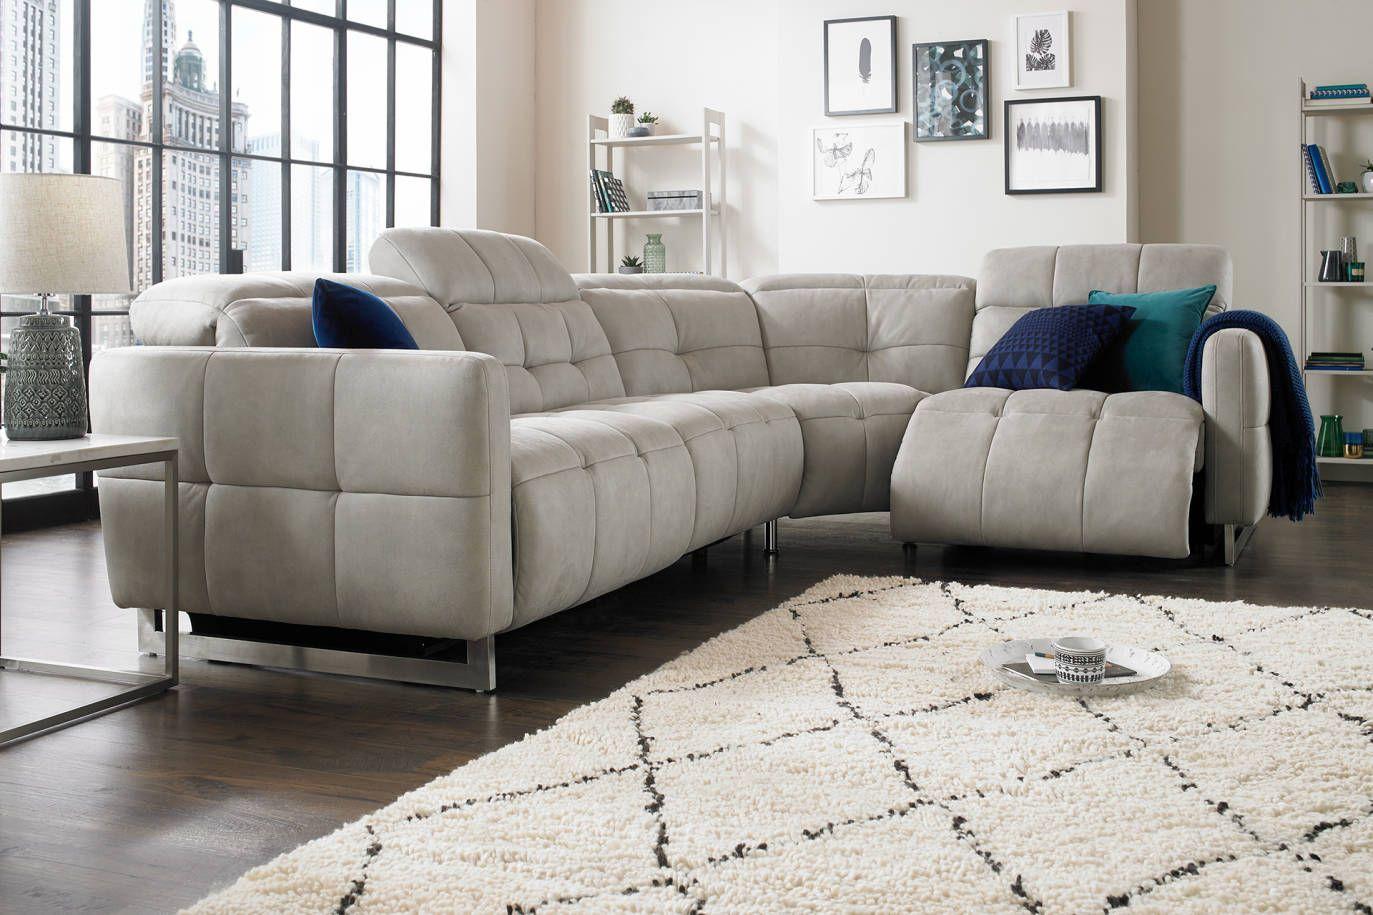 Marmont Sofology Classy Living Room Sofa Fabric Sofa